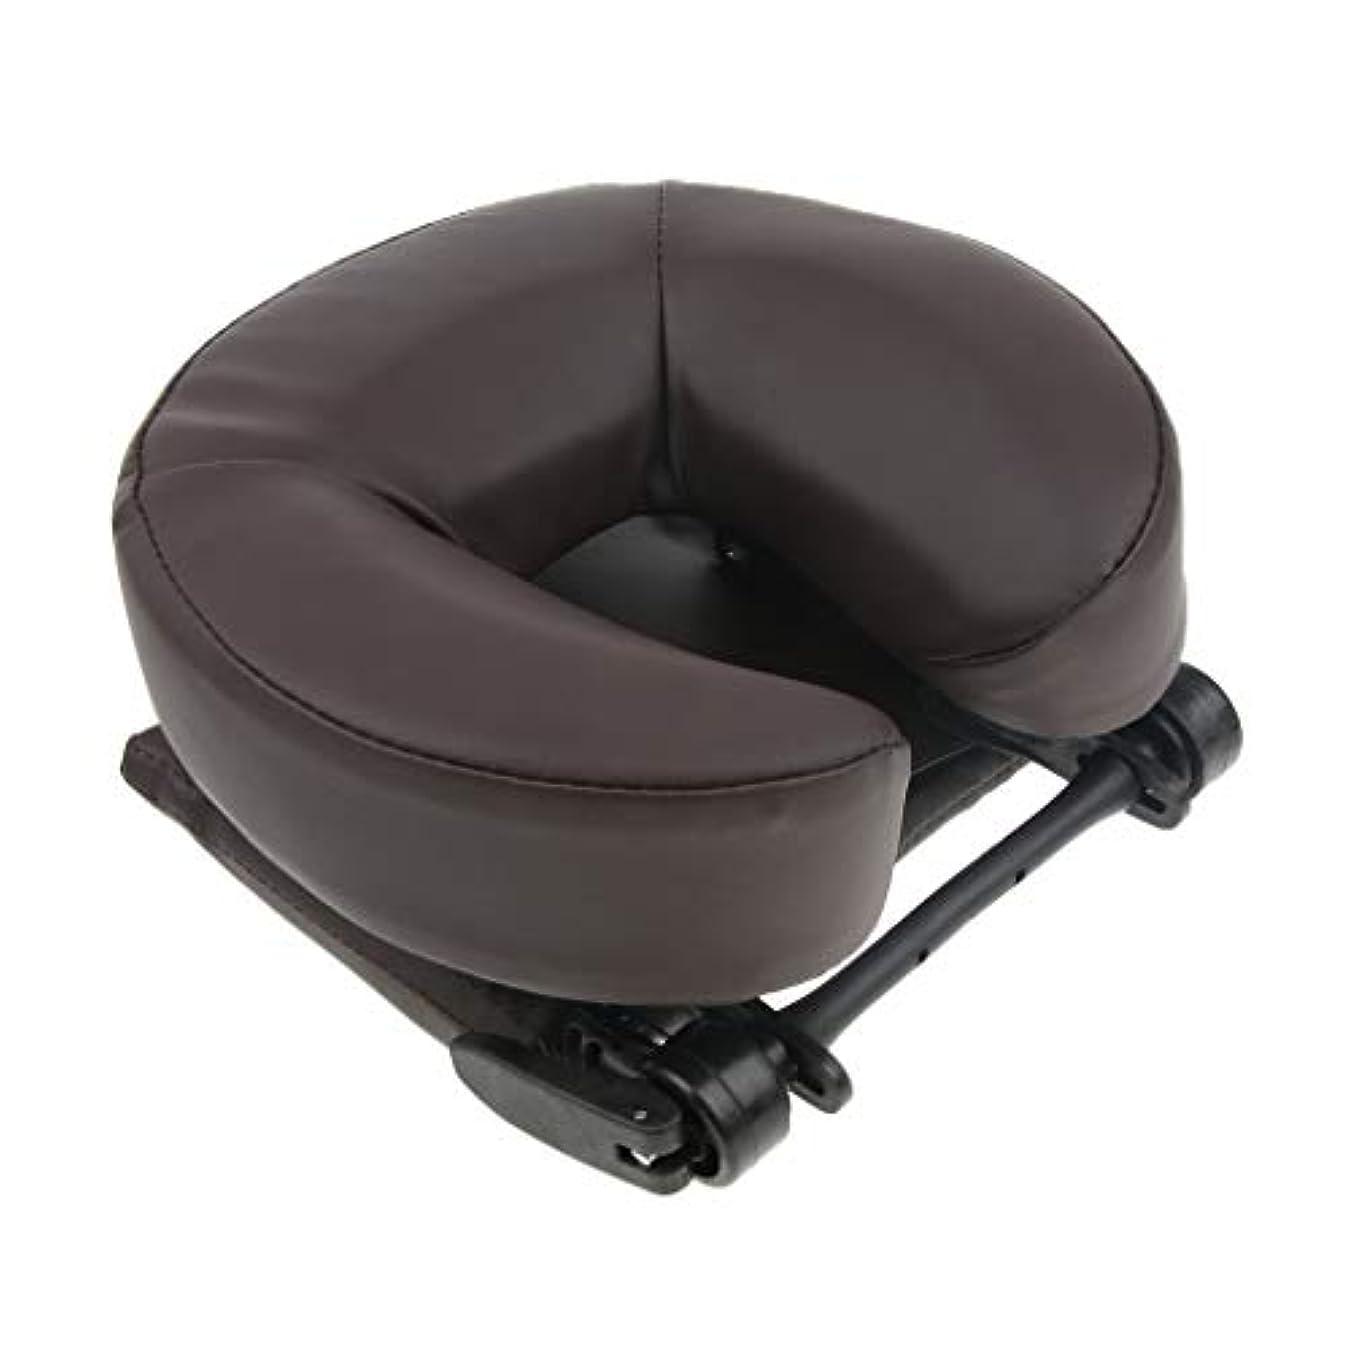 D DOLITY マッサージ用クッション ネックピロー 携帯枕 首枕 顔枕 寝枕 首枕 洗濯可能なカバー 2色選ぶ - コーヒー